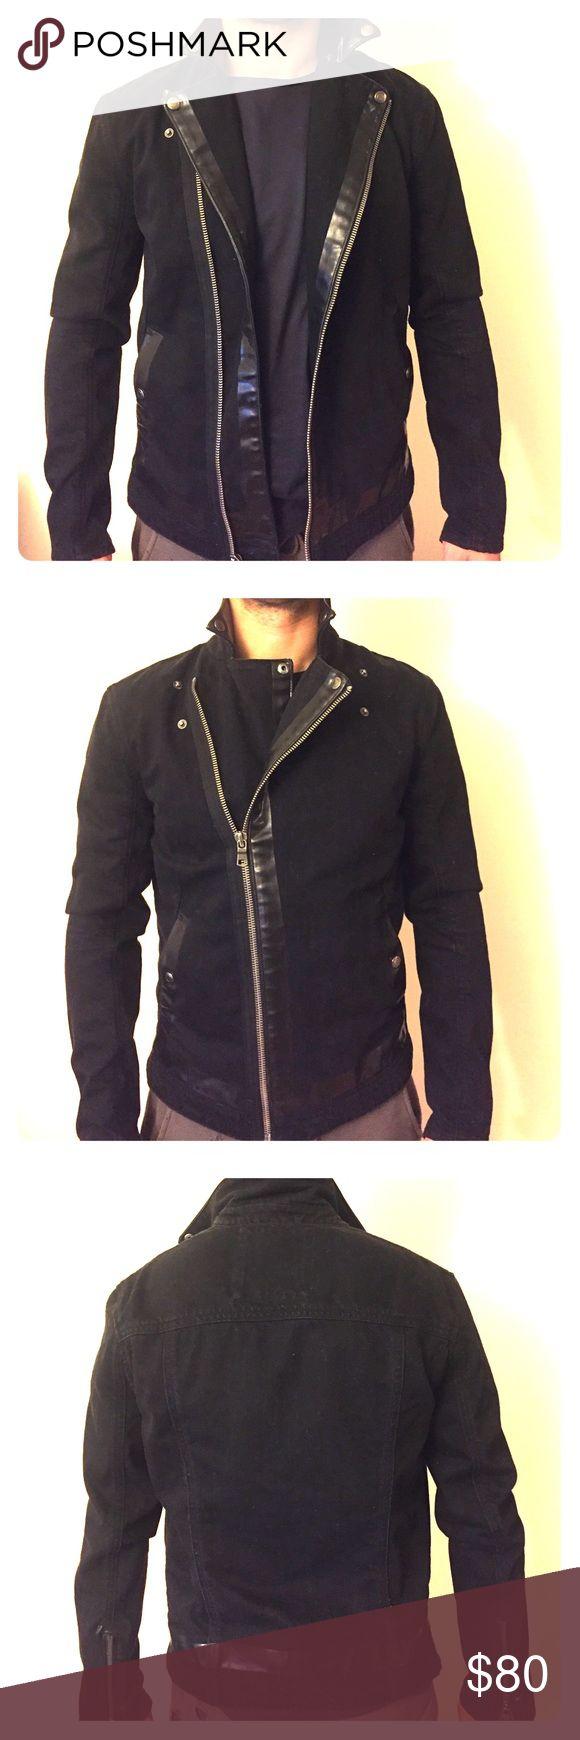 Armani Exchange Men's Black Jean Jacket Brand: Armani Exchange / color: black / material: jean, 100% cotton / pocket lining / size: medium / one time use, LIKE NEW. A/X Armani Exchange Jackets & Coats Lightweight & Shirt Jackets